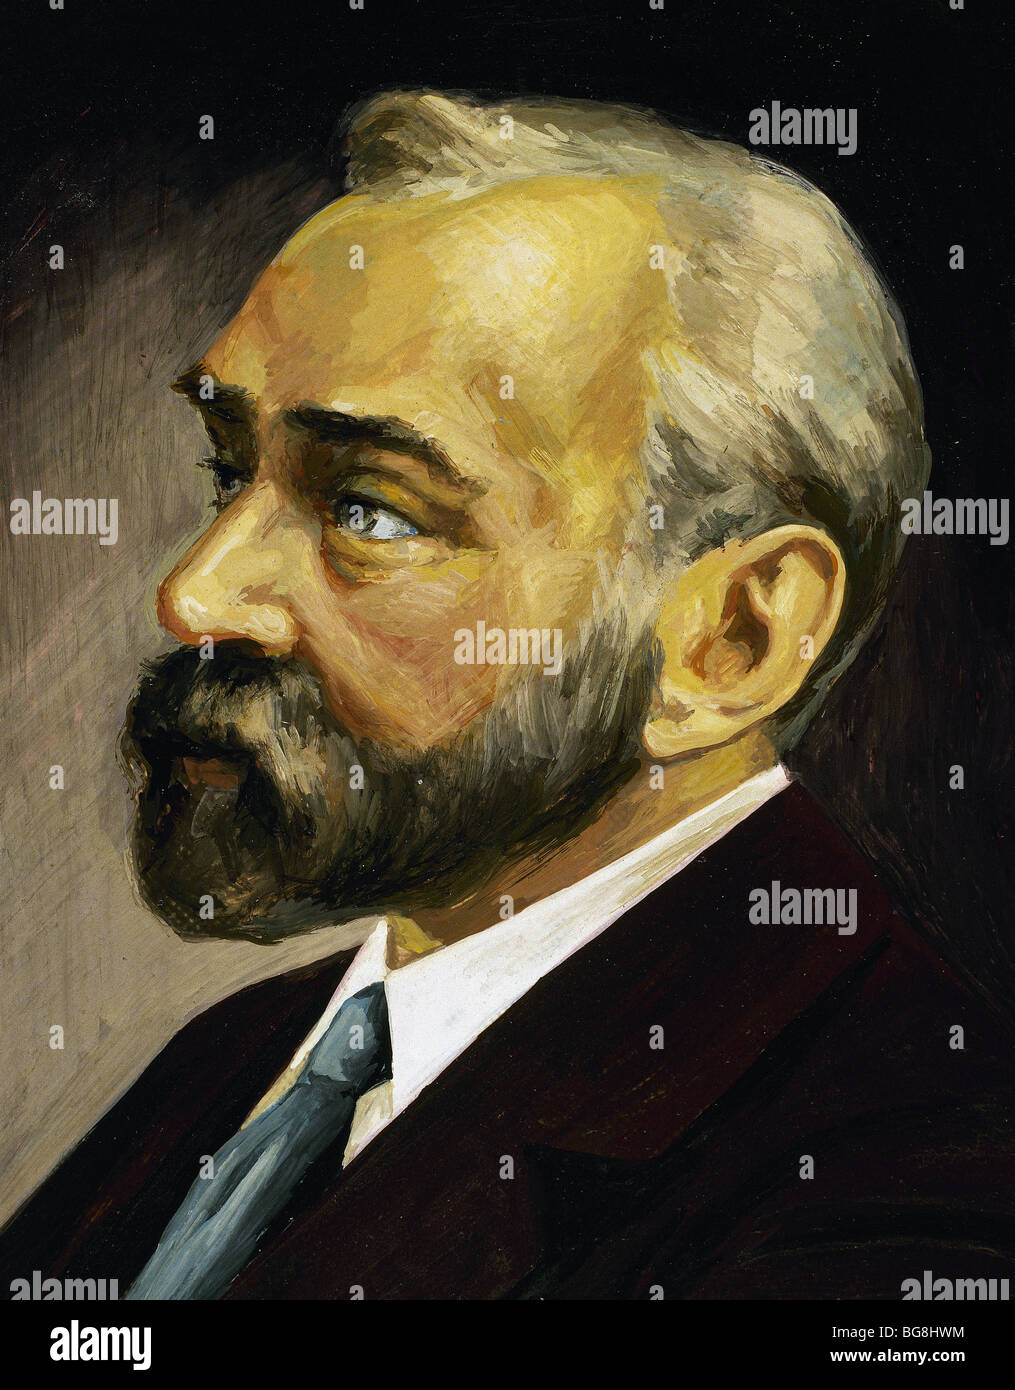 Nobel, Alfred (Stockholm 1833-San Remo, 1896). Chemiker. Stockbild